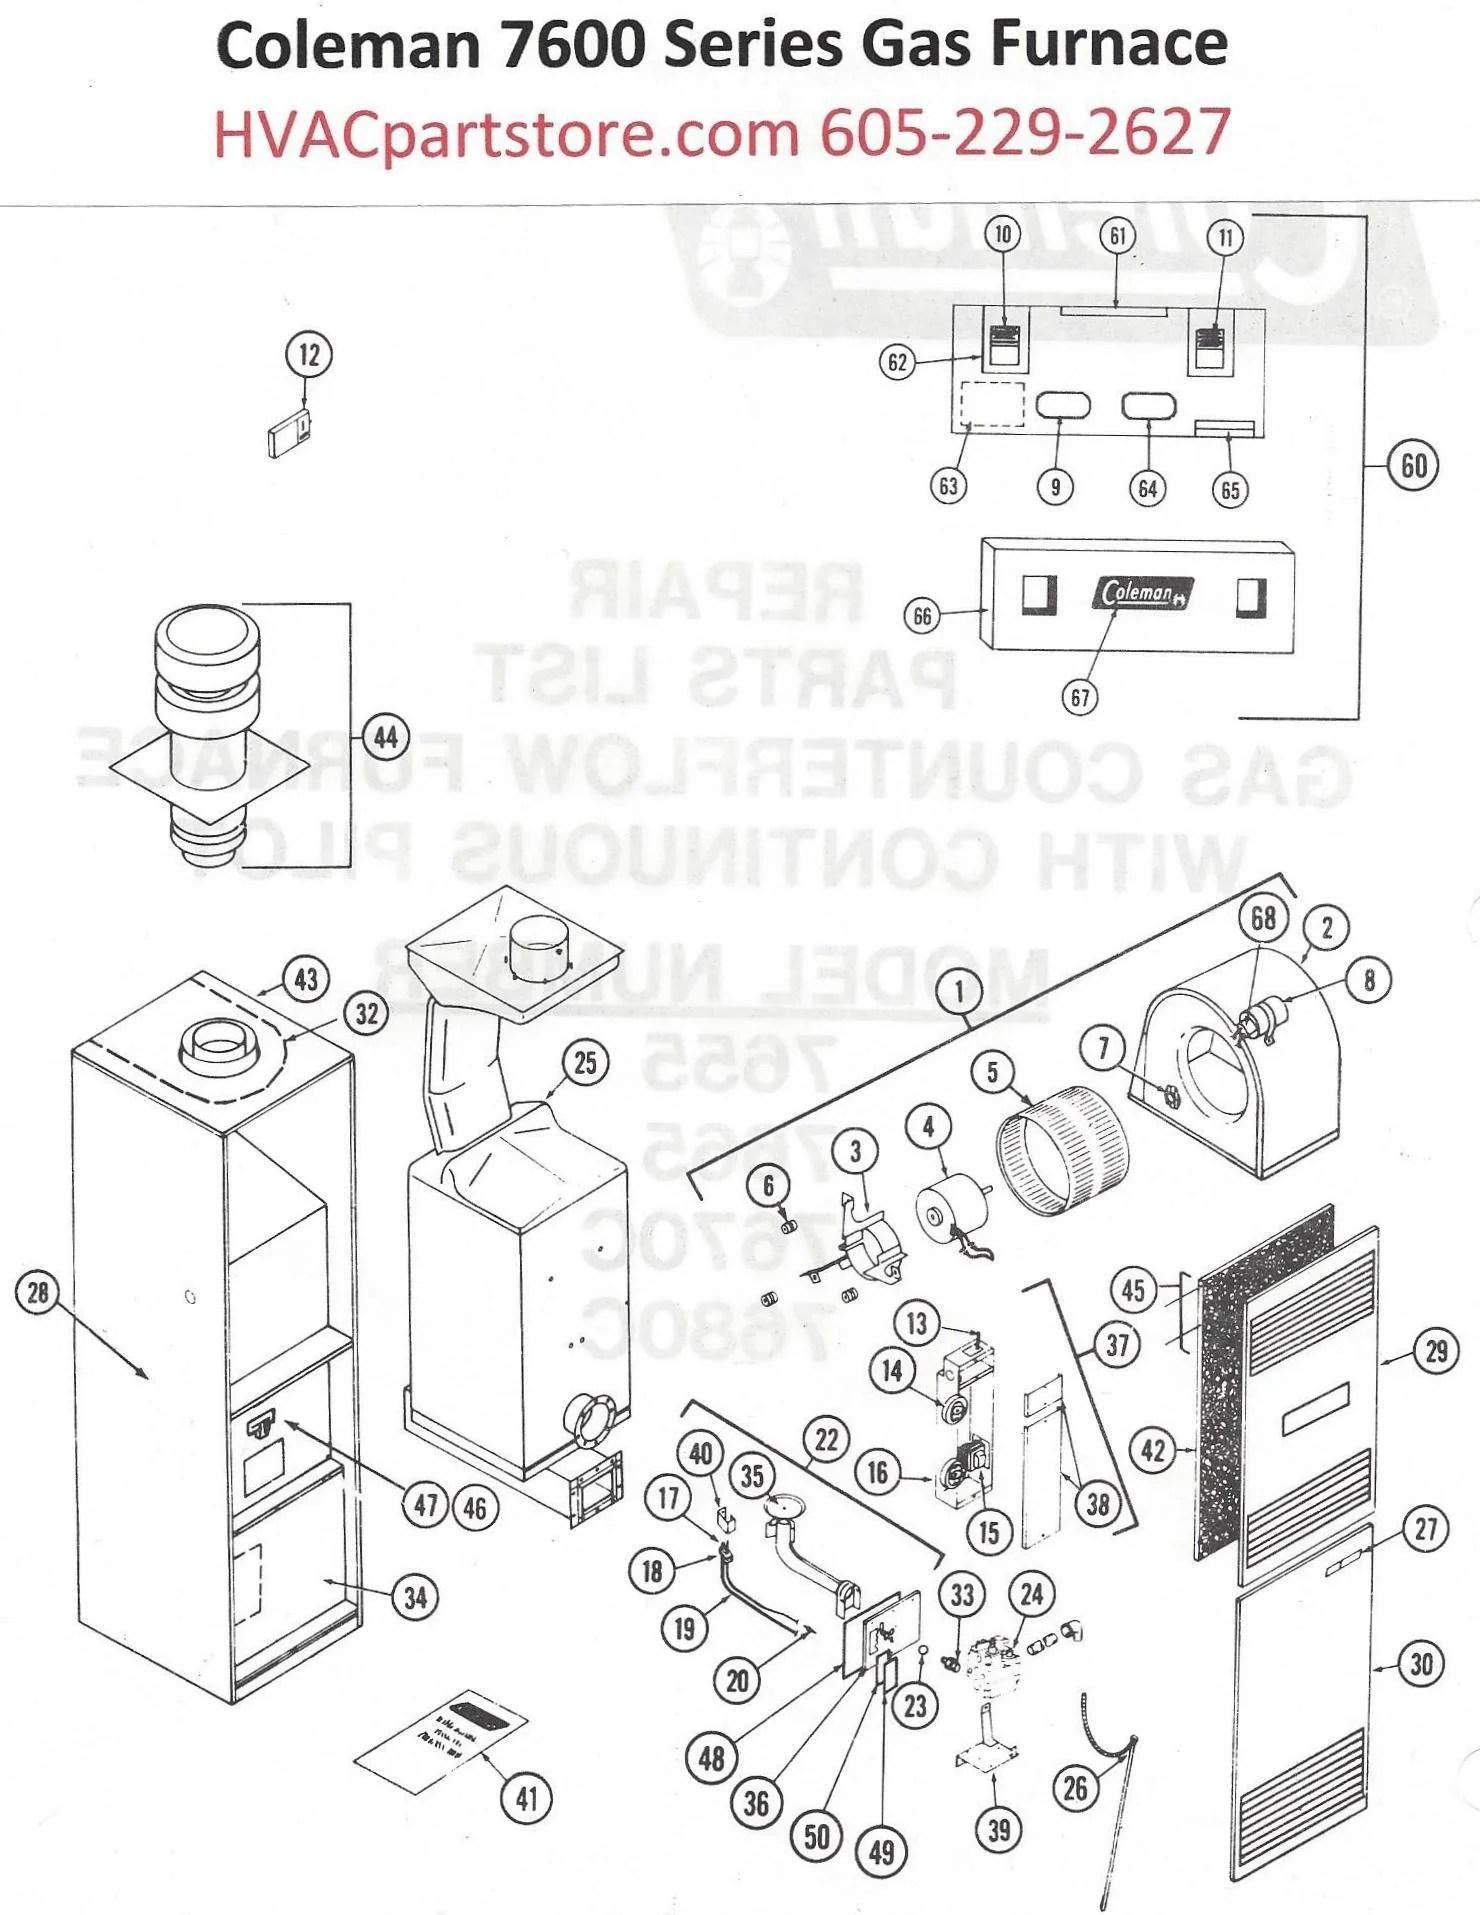 7655 7665Diagram_769ed5d1 a4fe 4157 985e c17014f70f35?resize\\\\\\\=840%2C1087\\\\\\\&ssl\\\\\\\=1 evcon thermostat wiring diagram wiring diagram simonand coleman evcon thermostat wiring diagram at edmiracle.co